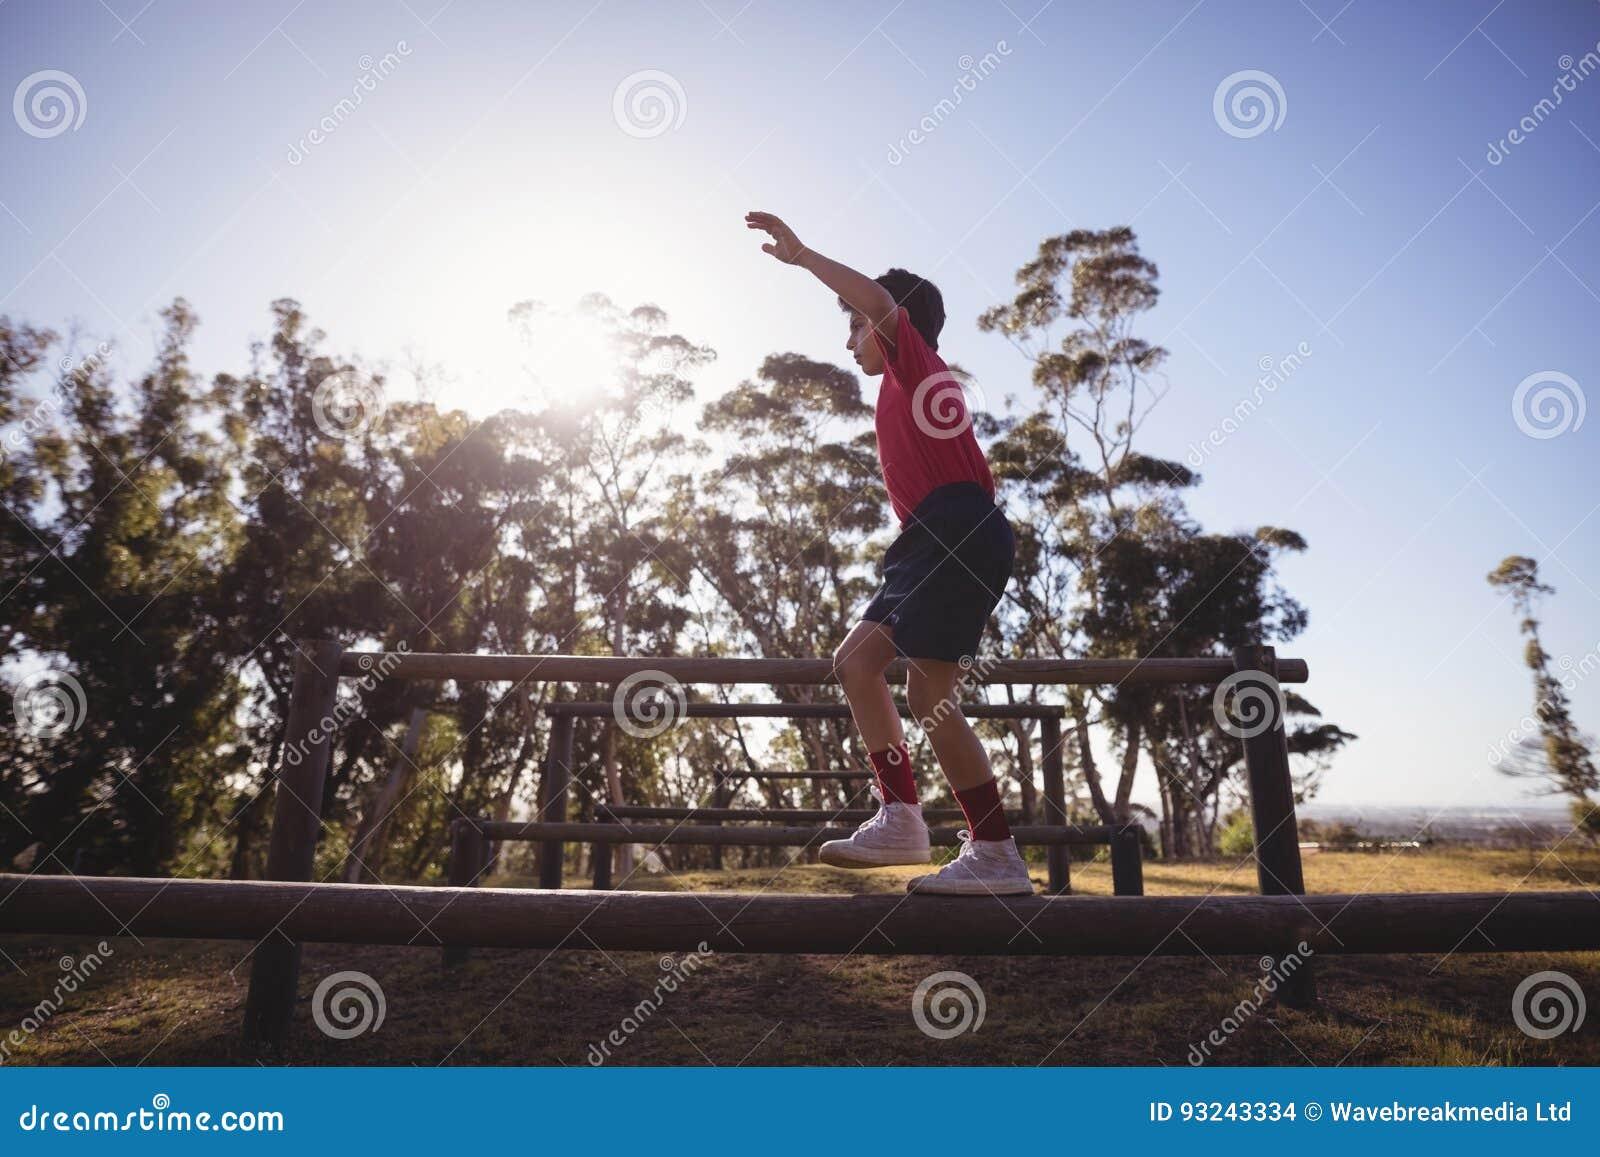 Pojke som går på hinder under hinderkurs